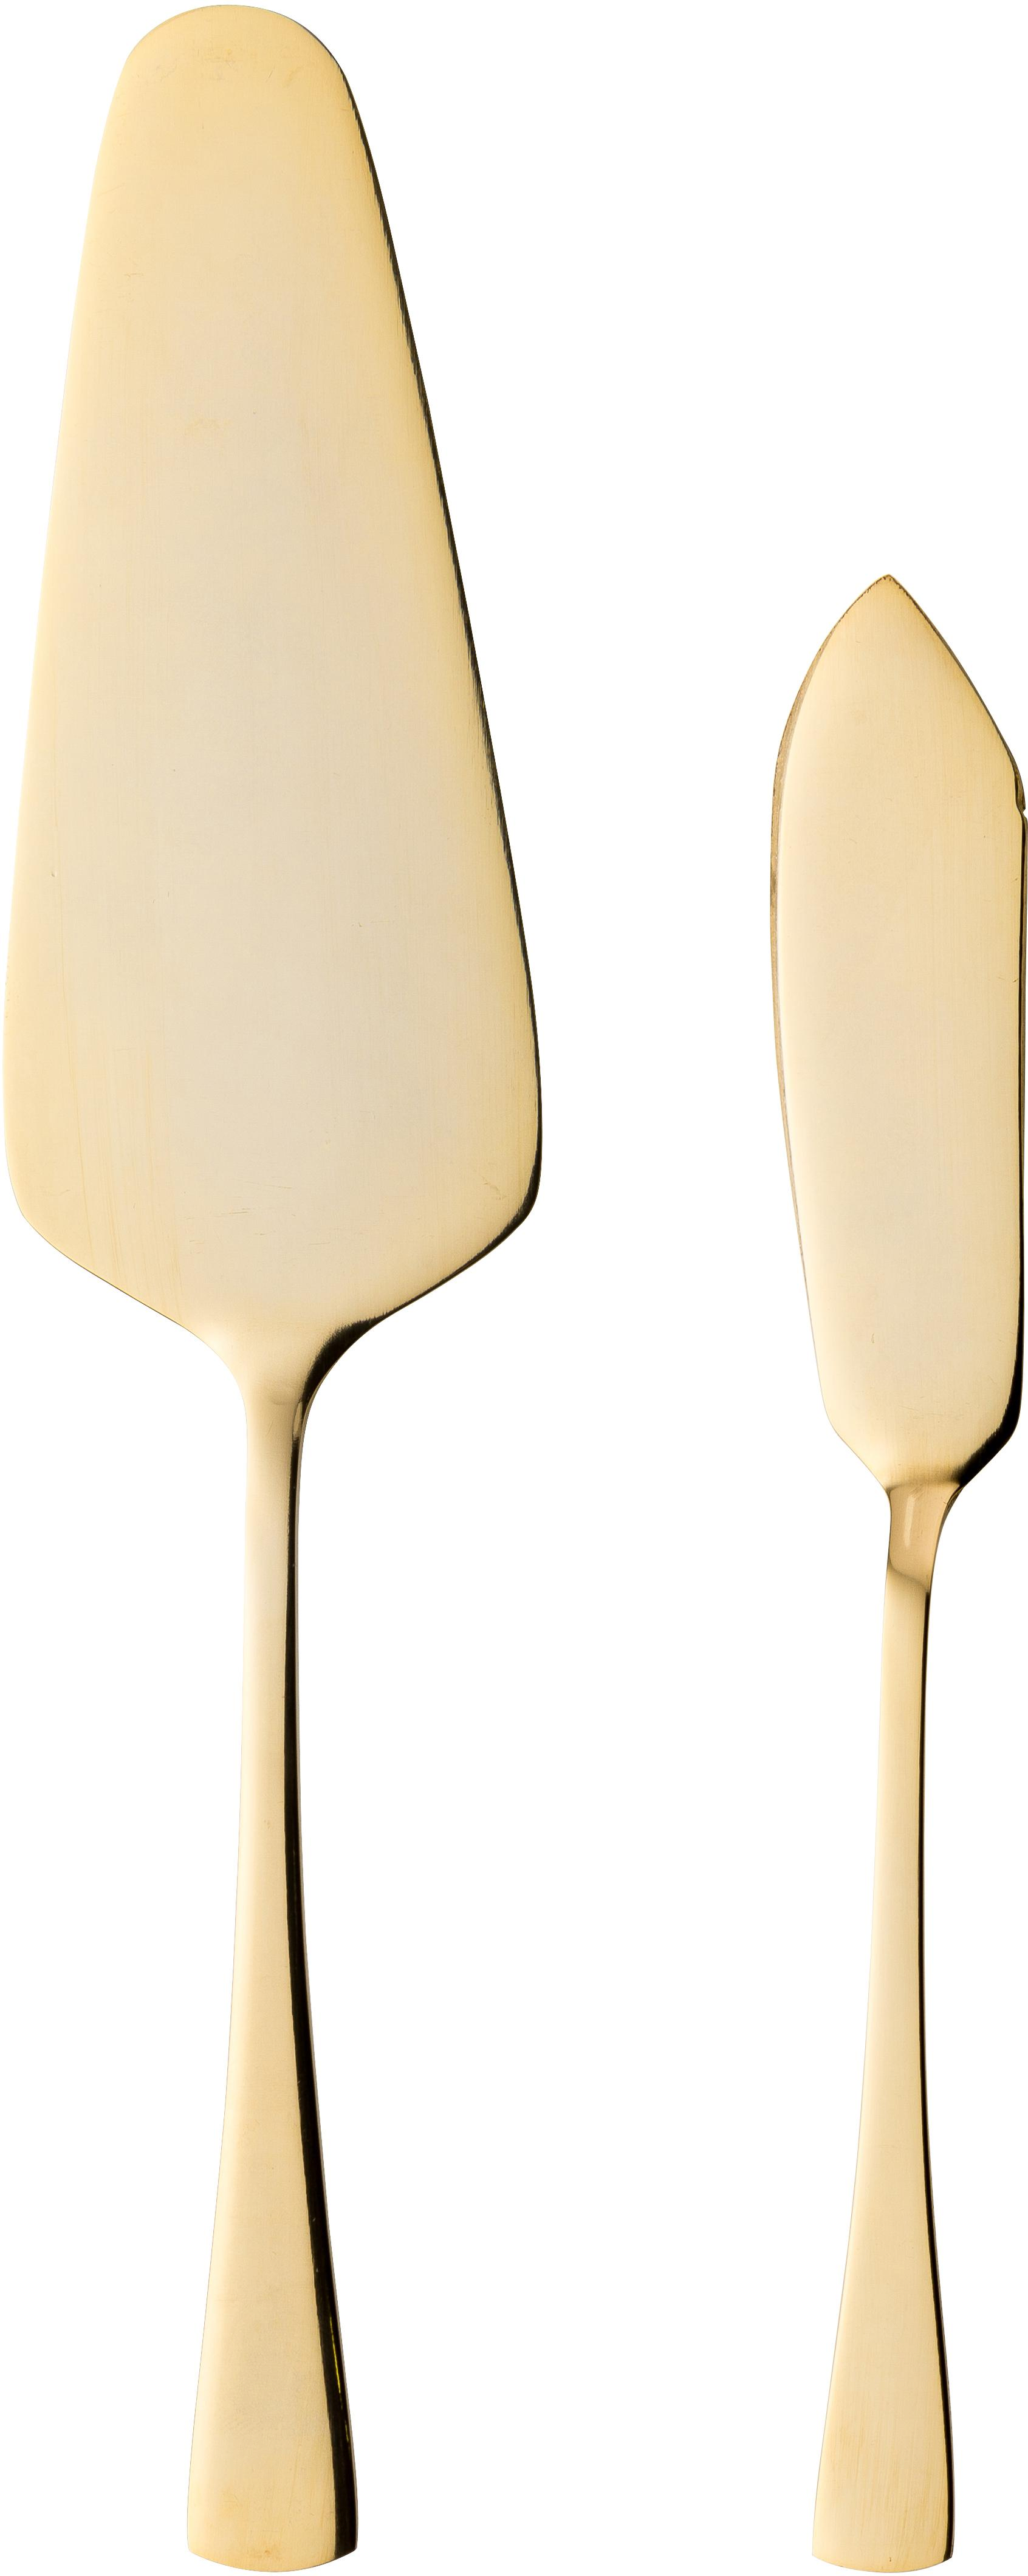 Goldfarbenes Tortenheber-Set Matera aus Edelstahl, 2-teilig, Edelstahl, Goldfarben, Sondergrößen